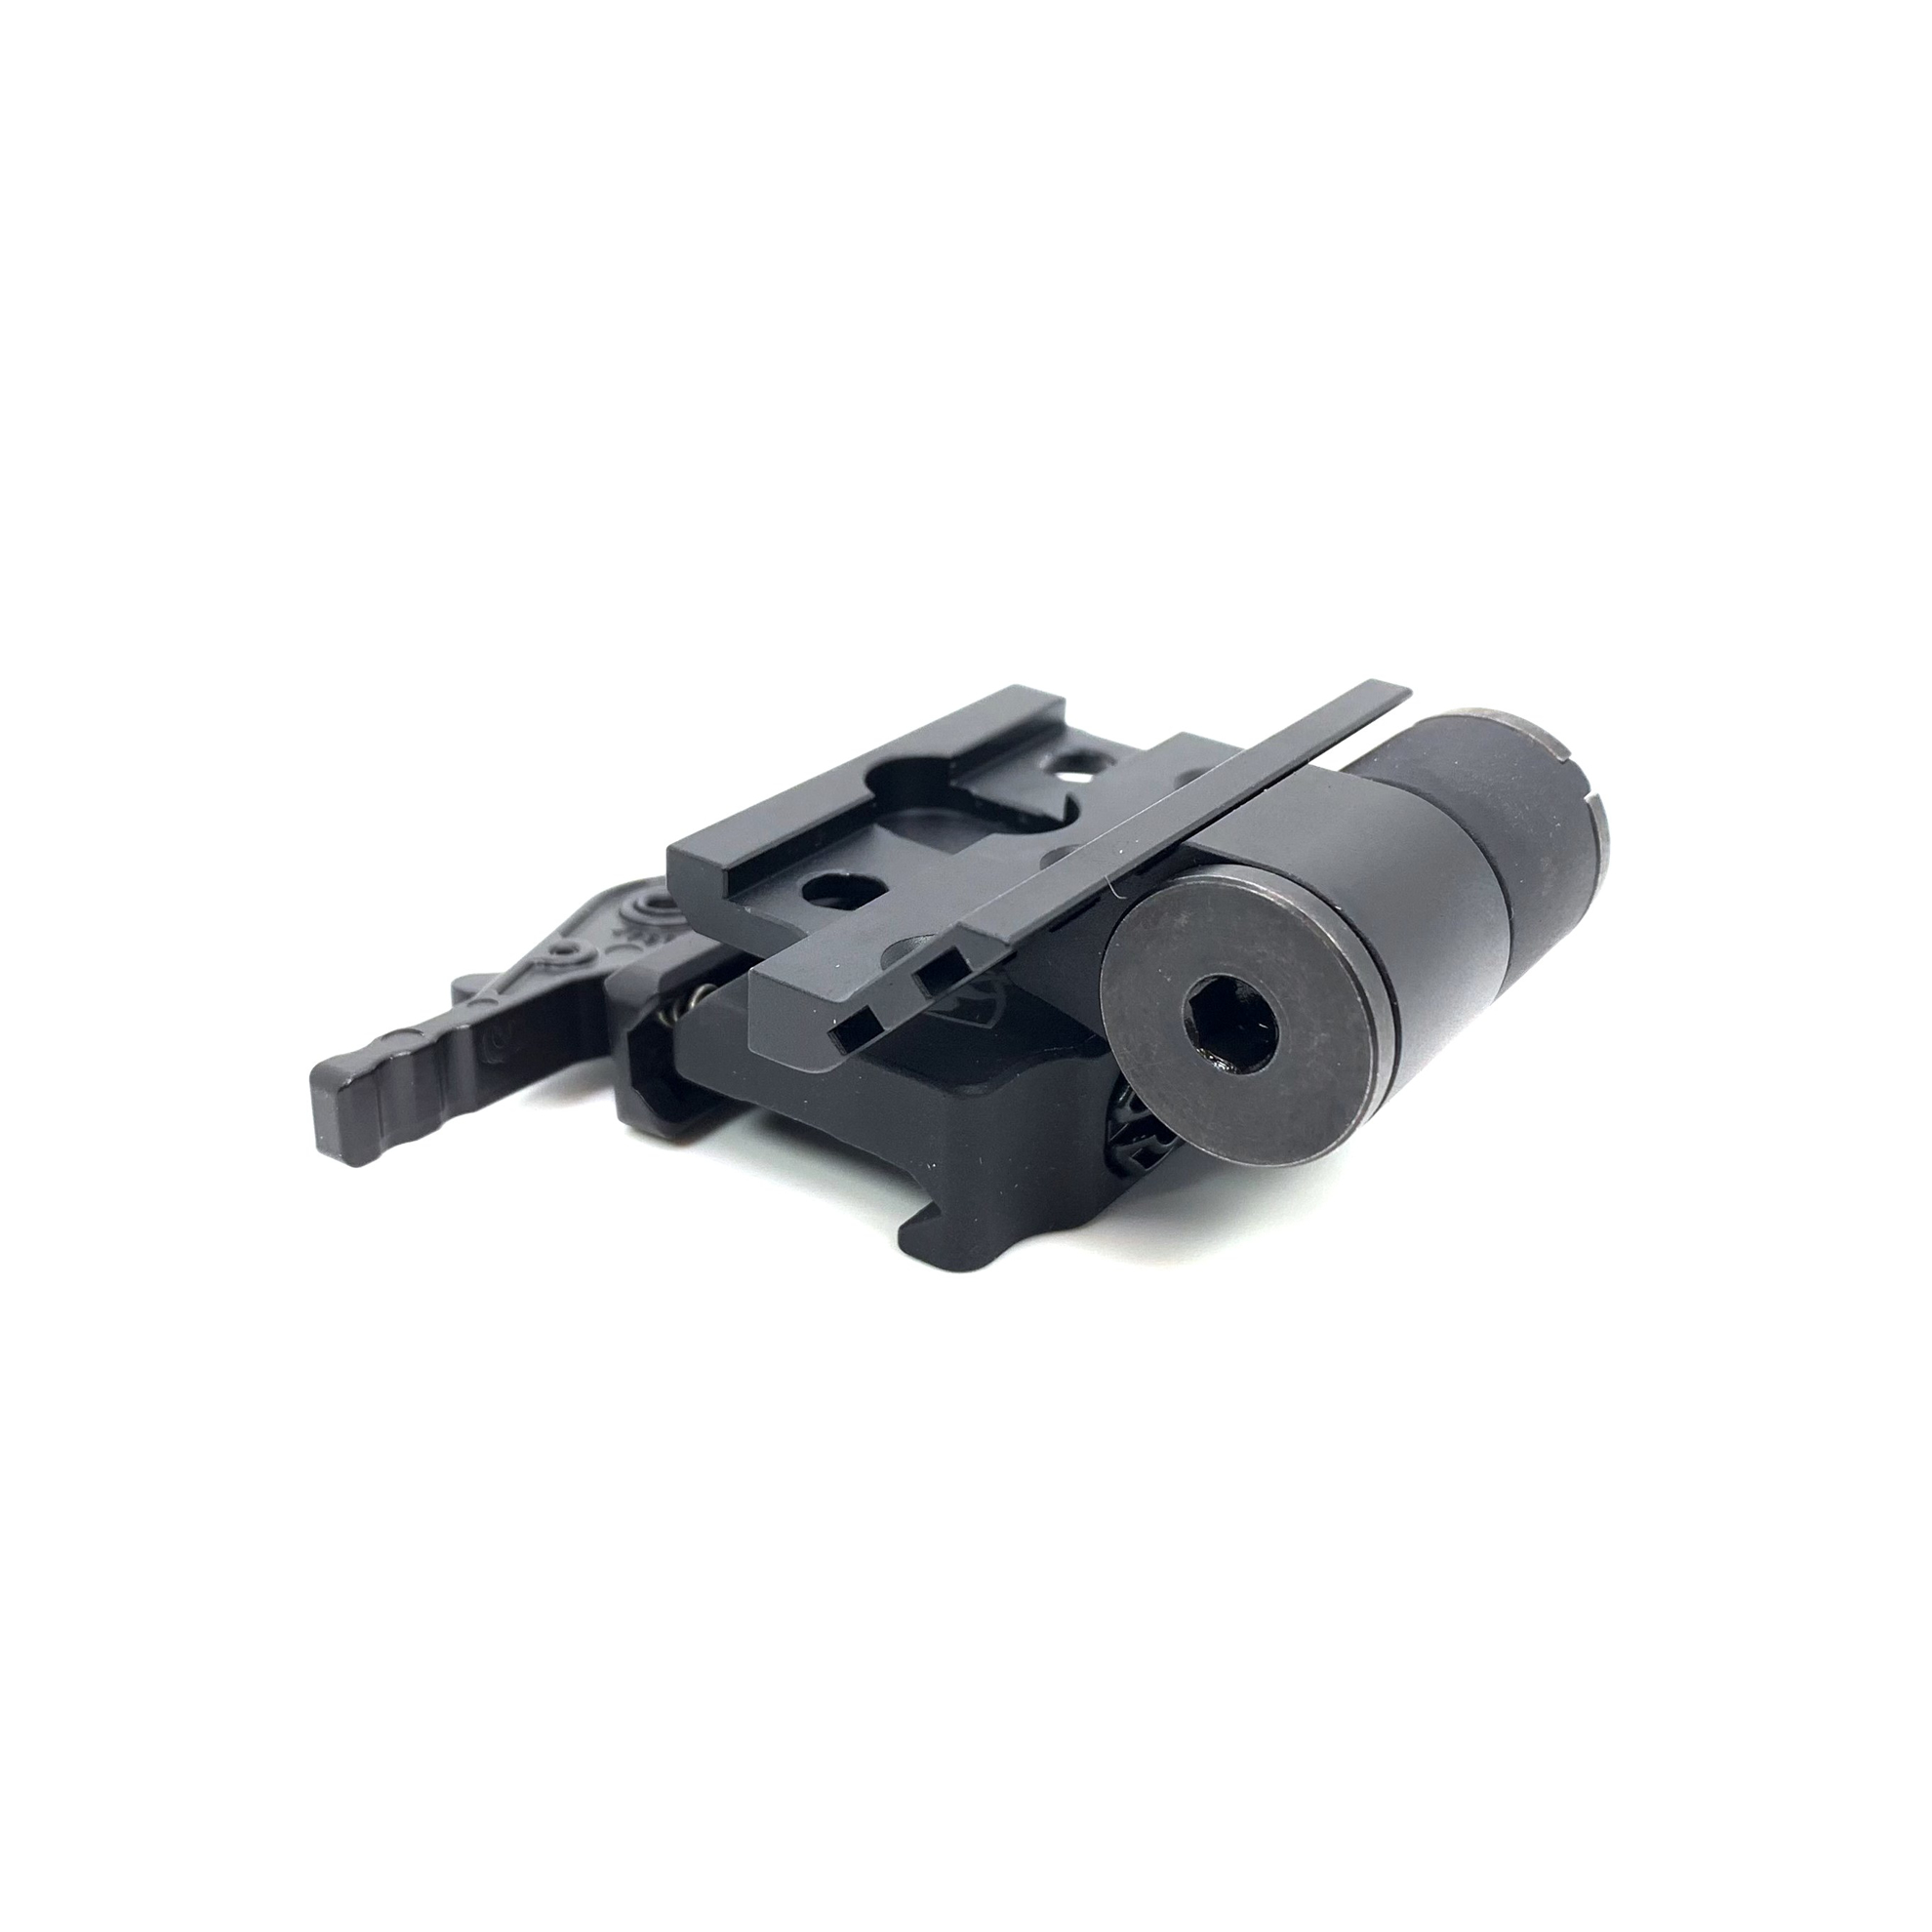 american defense mfg adm flip off magnifier mount eotech vmx-3t optics